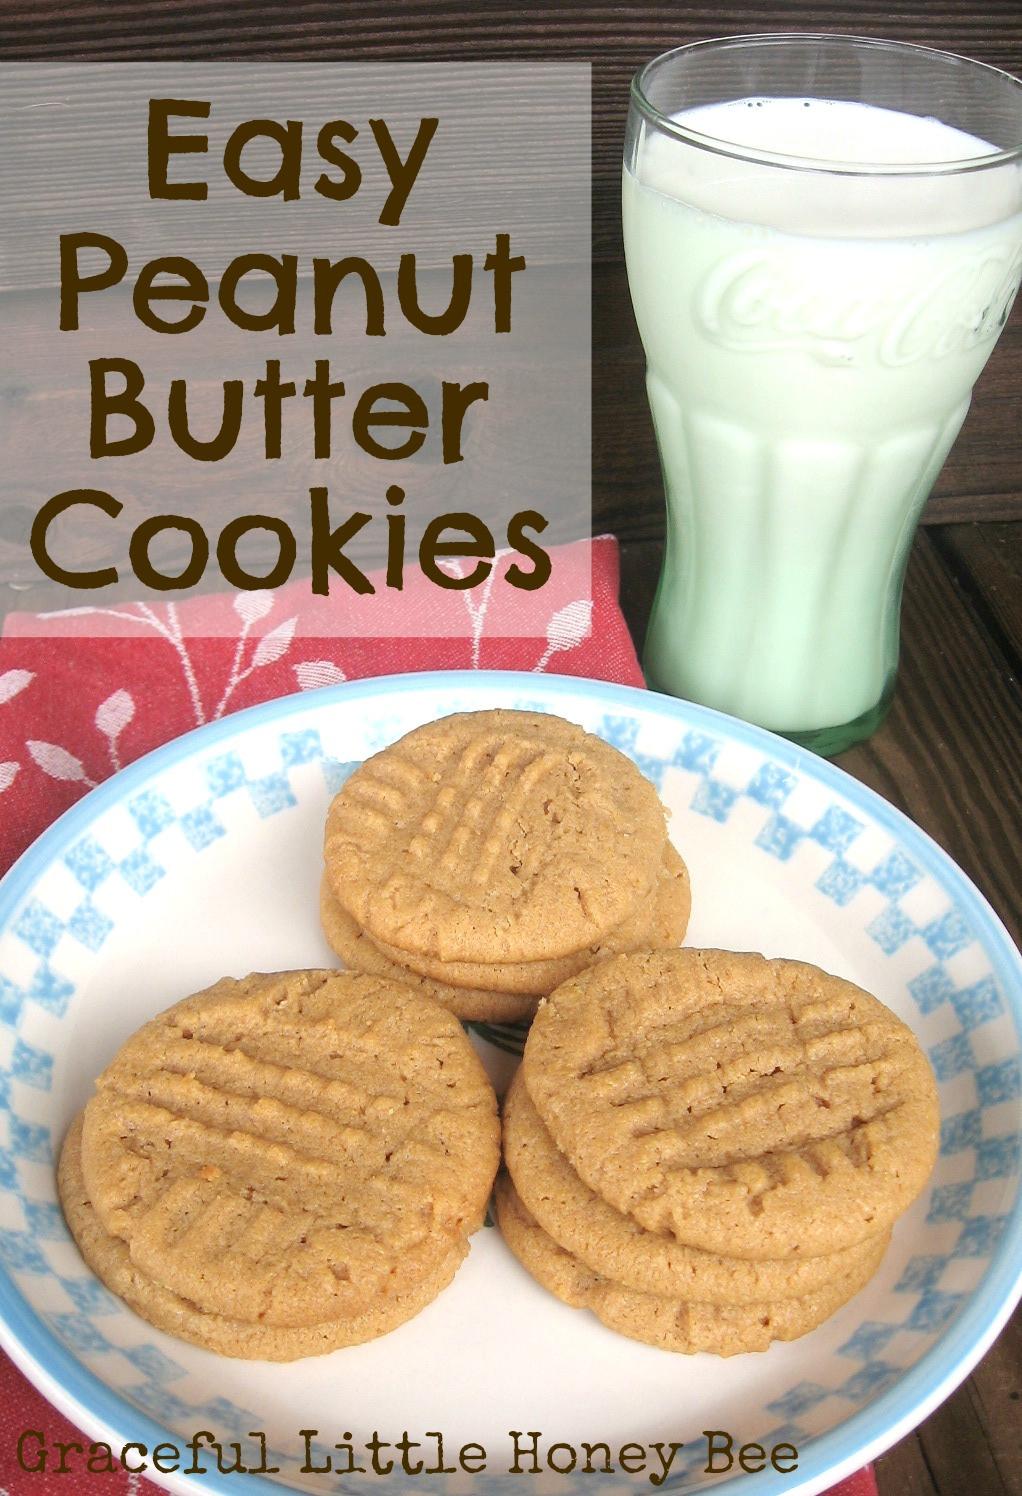 Peanut Butter Cookies Easy  Easy Peanut Butter Cookies Graceful Little Honey Bee